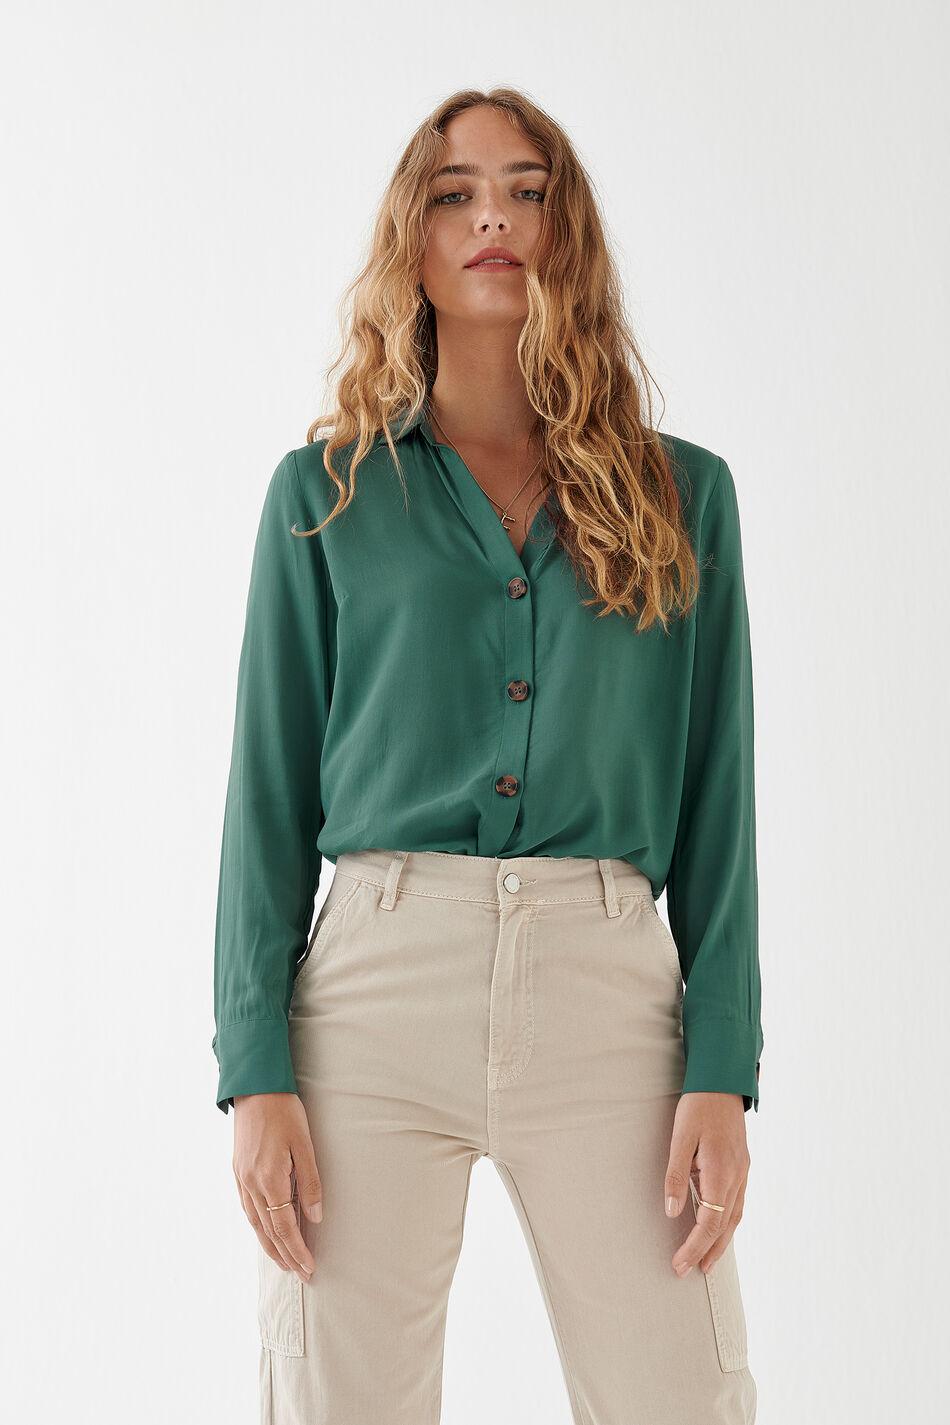 Gina Tricot Wendy shirt